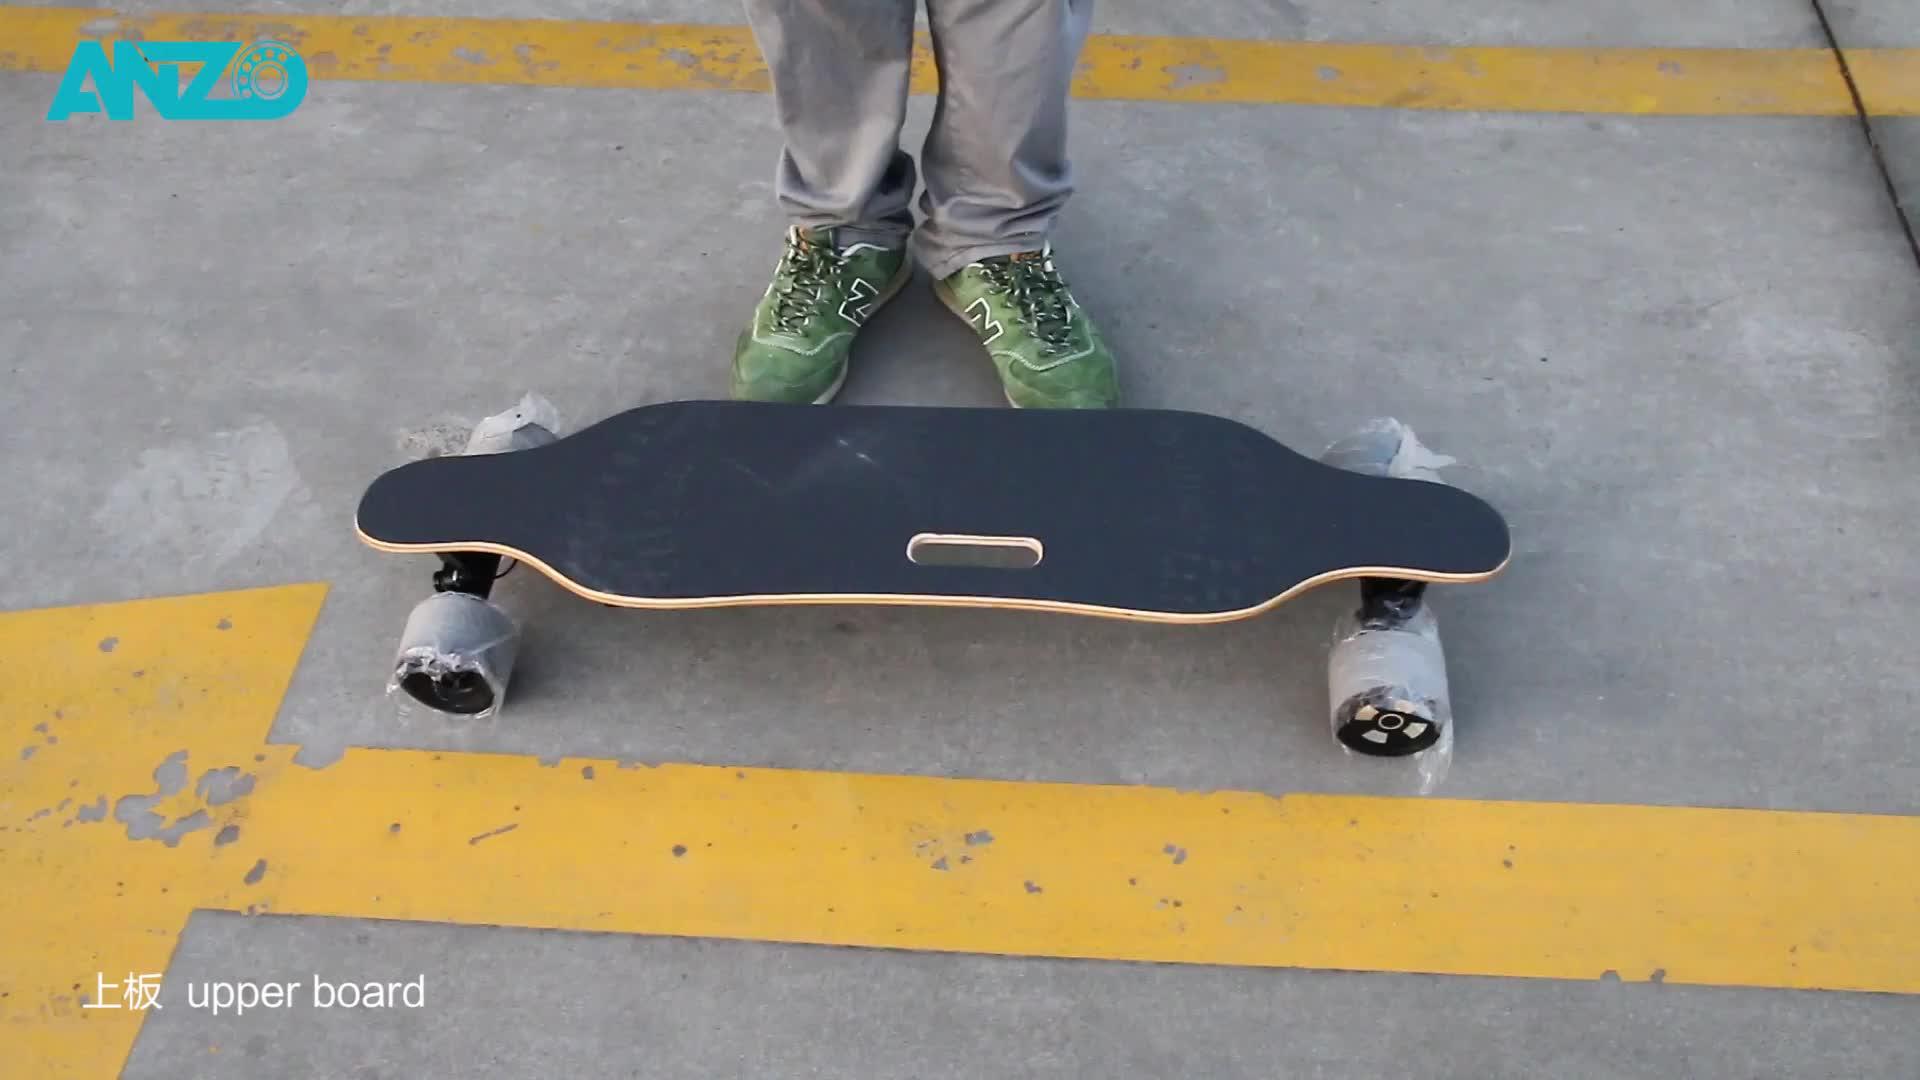 Impulsionado E Skate Longboard Skate Elétrico Rápido